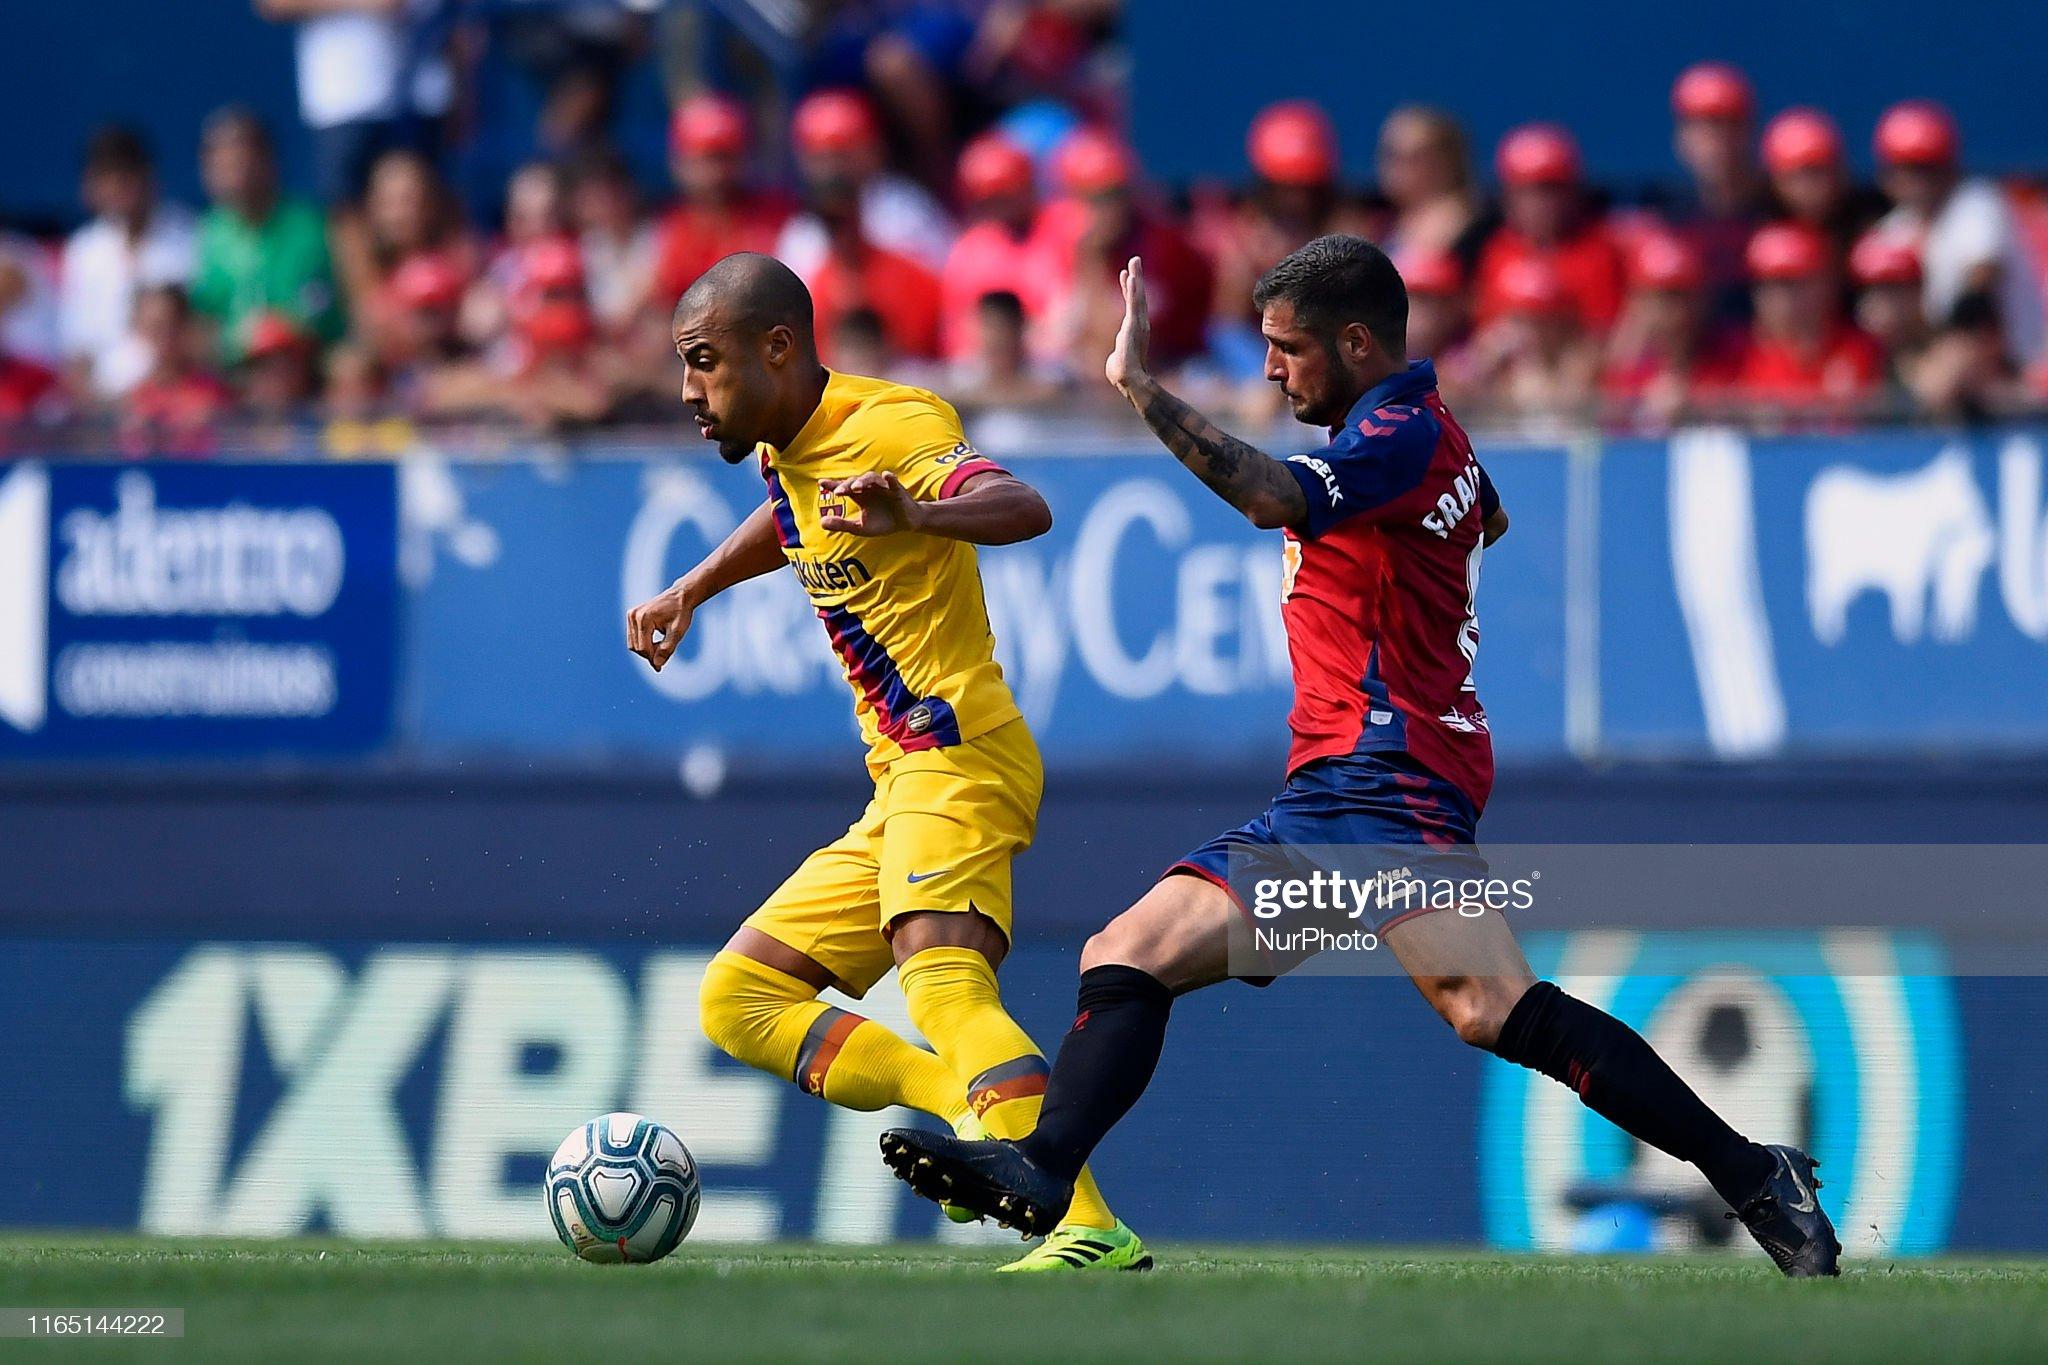 صور مباراة : أوساسونا - برشلونة 2-2 ( 31-08-2019 )  Rafinha-of-barcelona-and-fran-merida-of-osasuna-competes-for-the-ball-picture-id1165144222?s=2048x2048